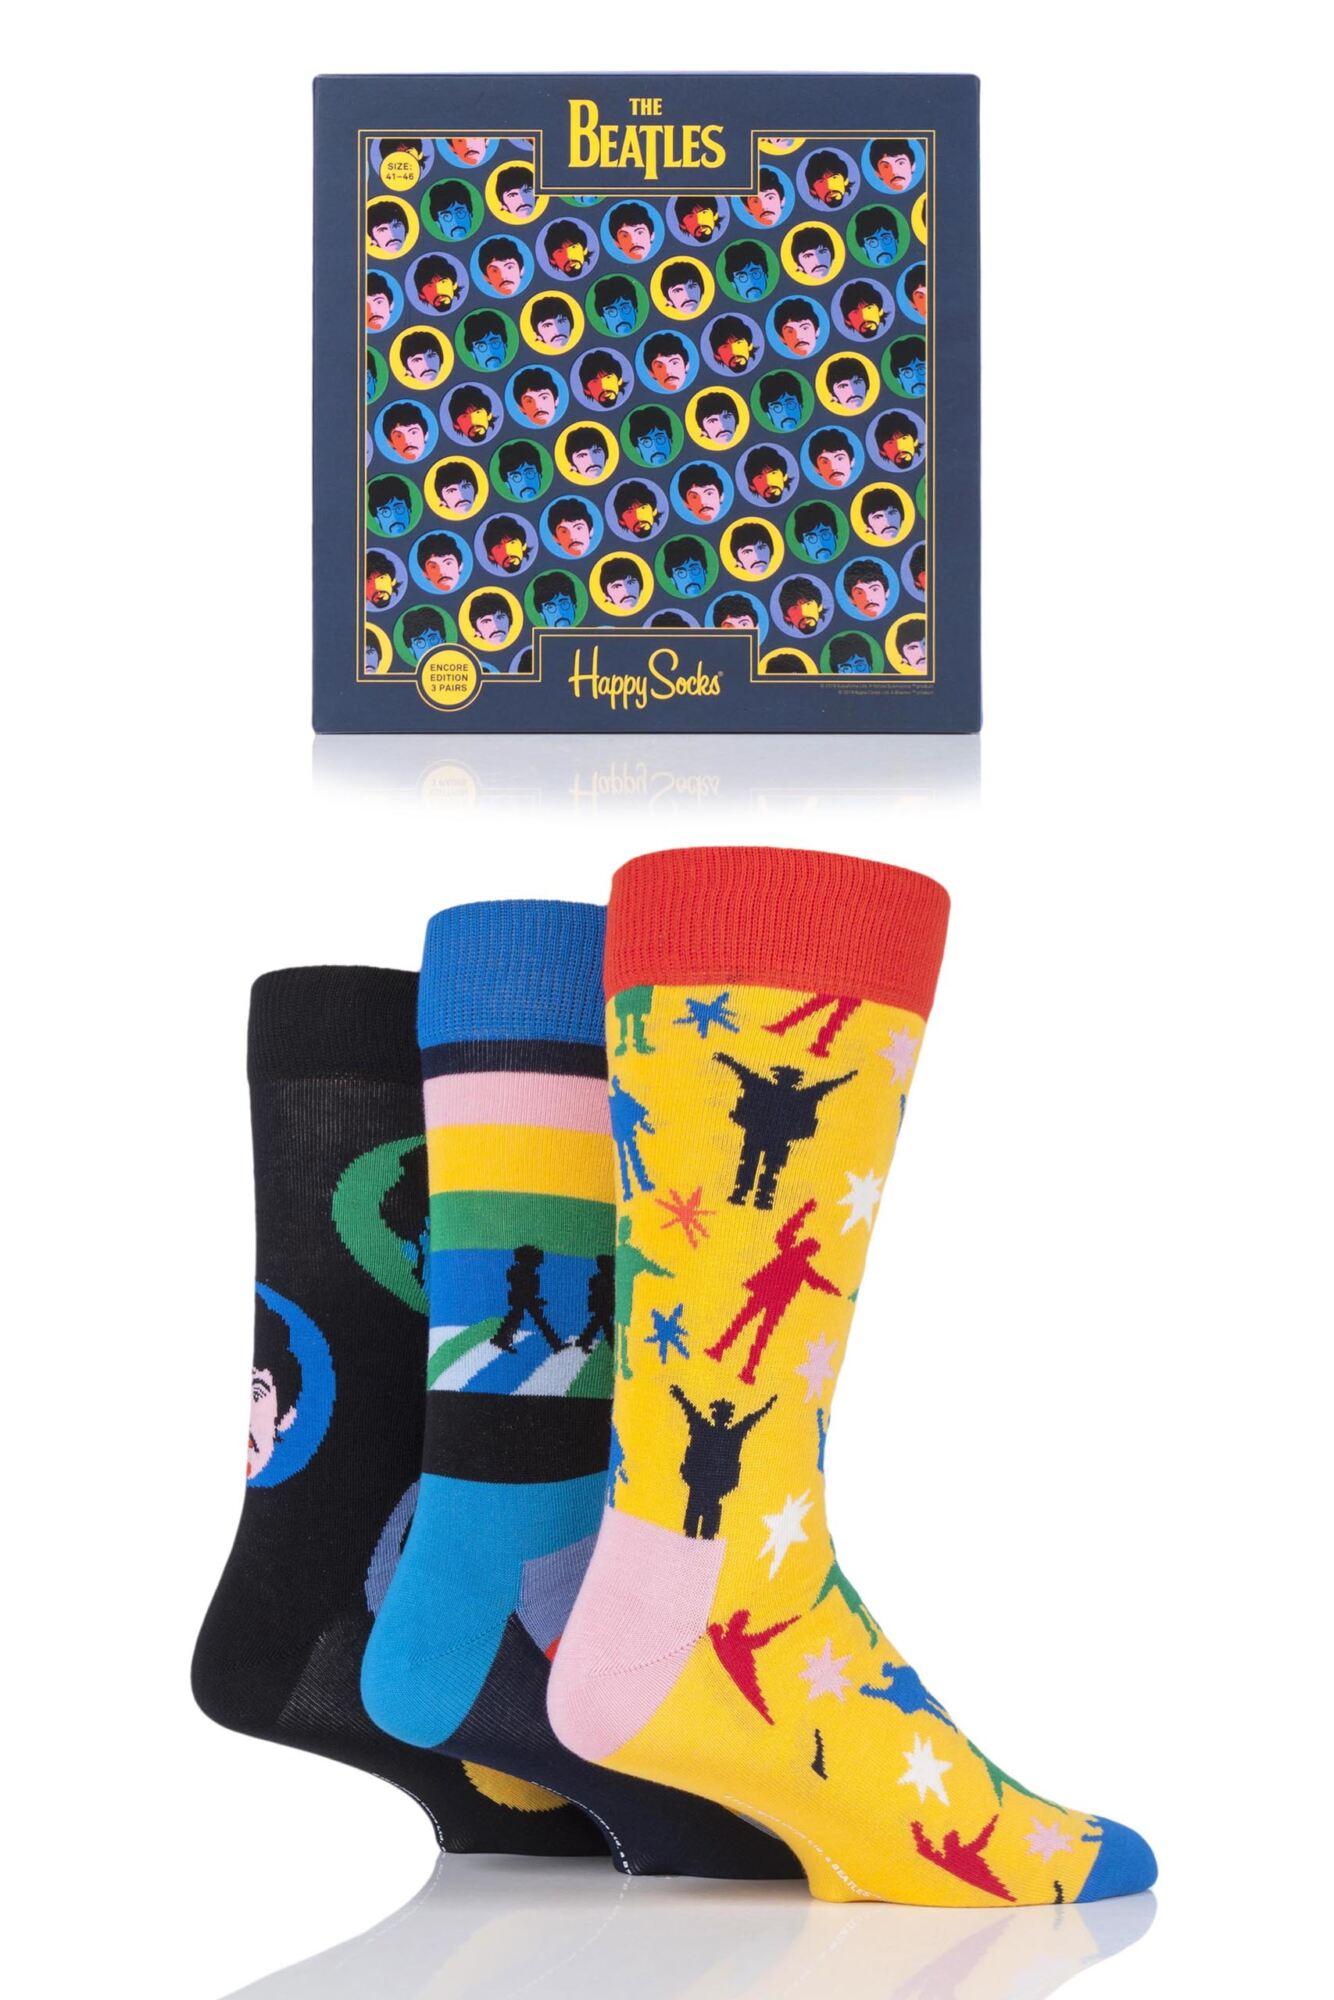 3 Pair The Beatles 2019 Gift Boxed Cotton Socks Unisex - Happy Socks